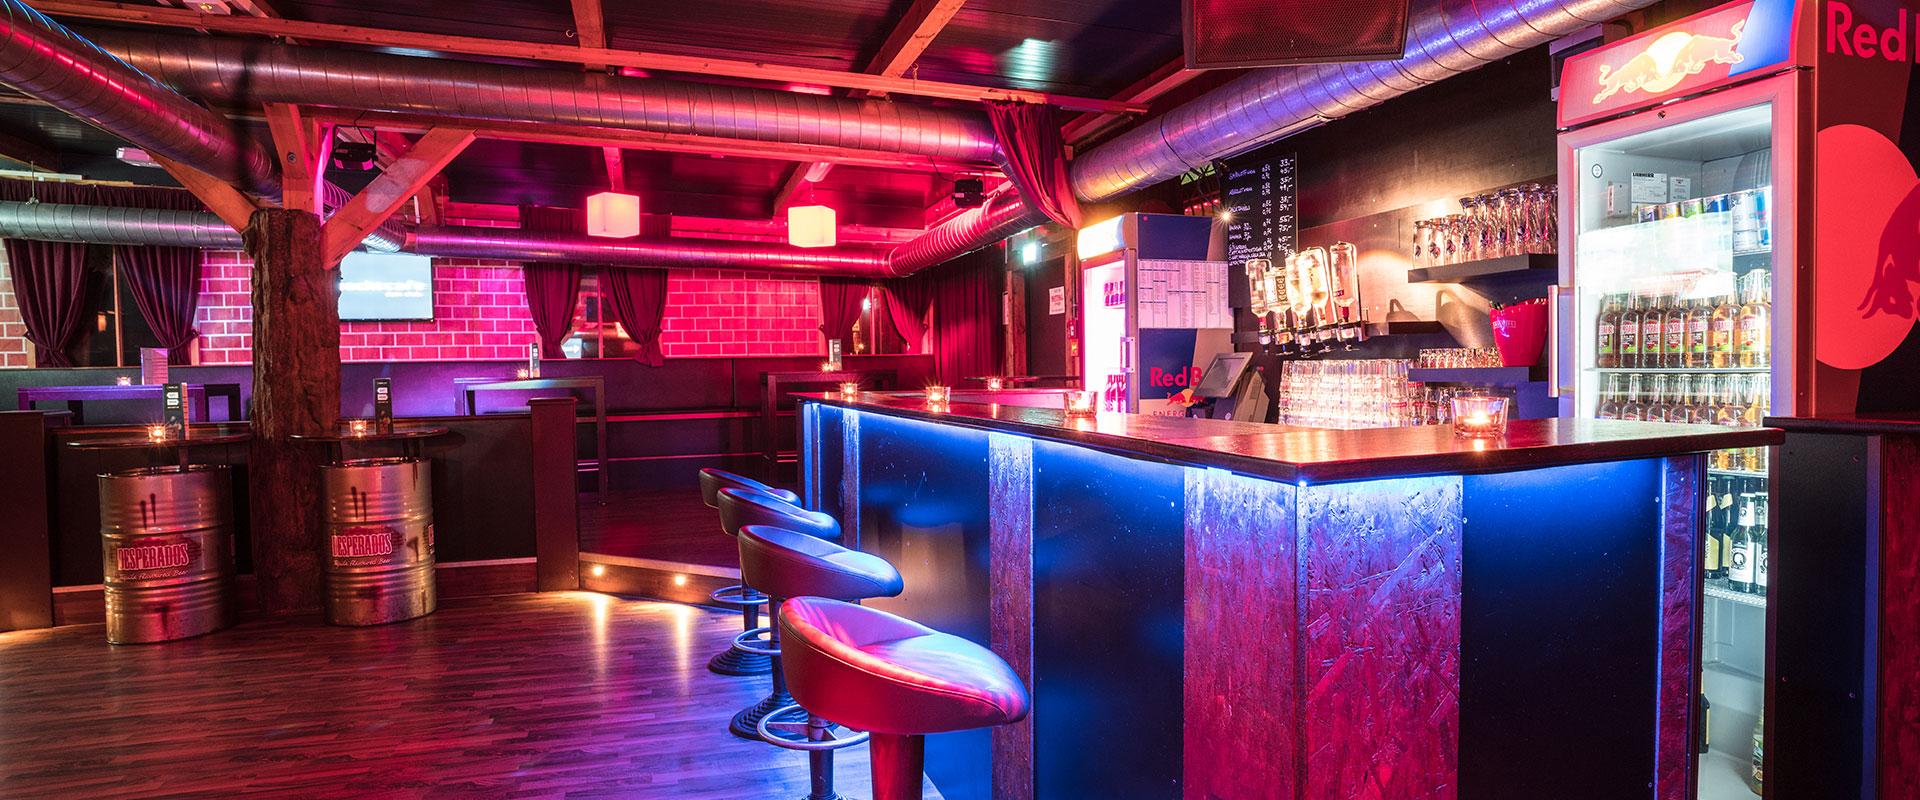 Single bar freising